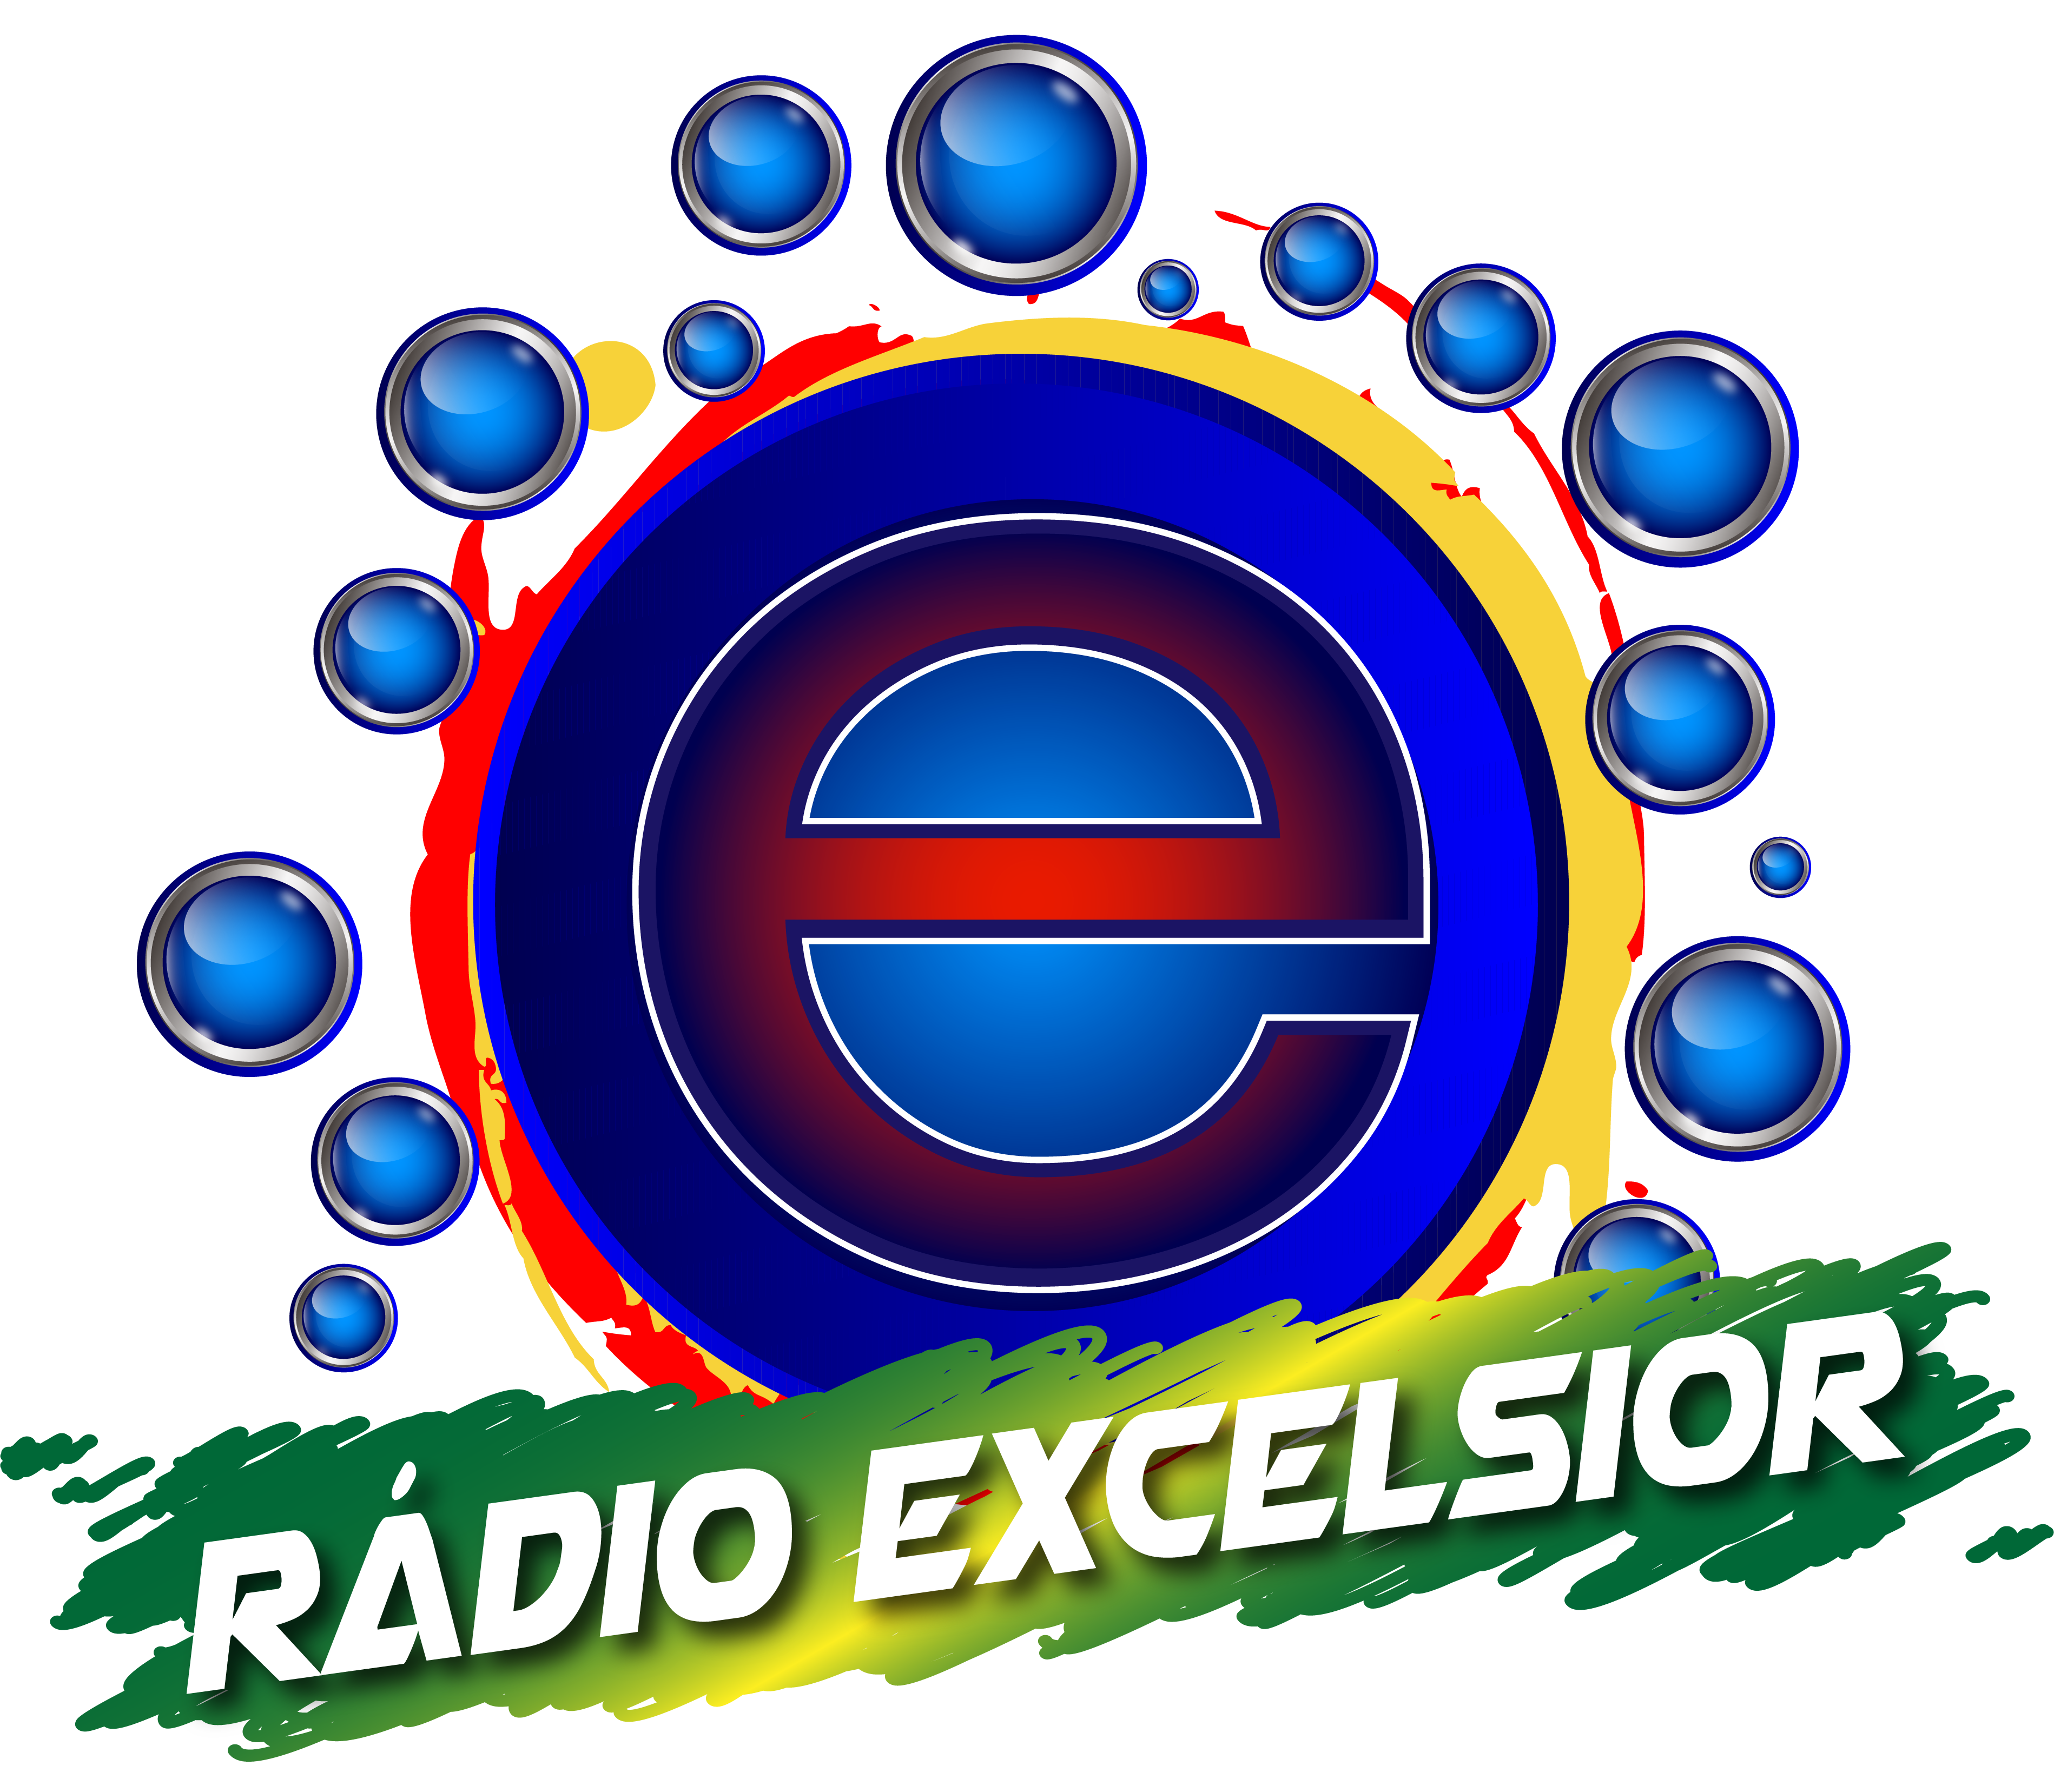 Nova logo radio excelsior